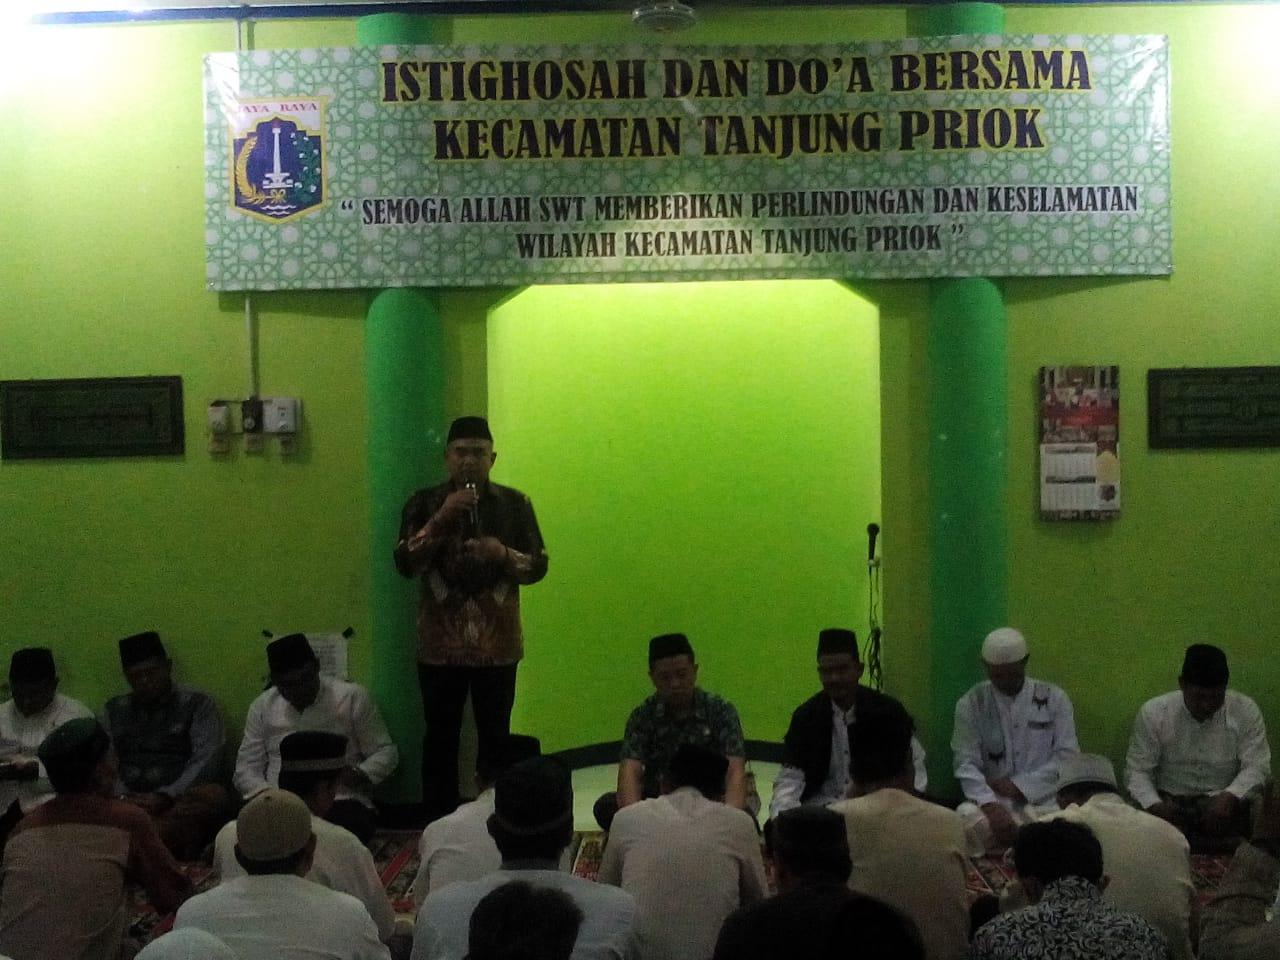 Kecamatan Priok Gelar Istiqosah Dan Dzikir Bersama